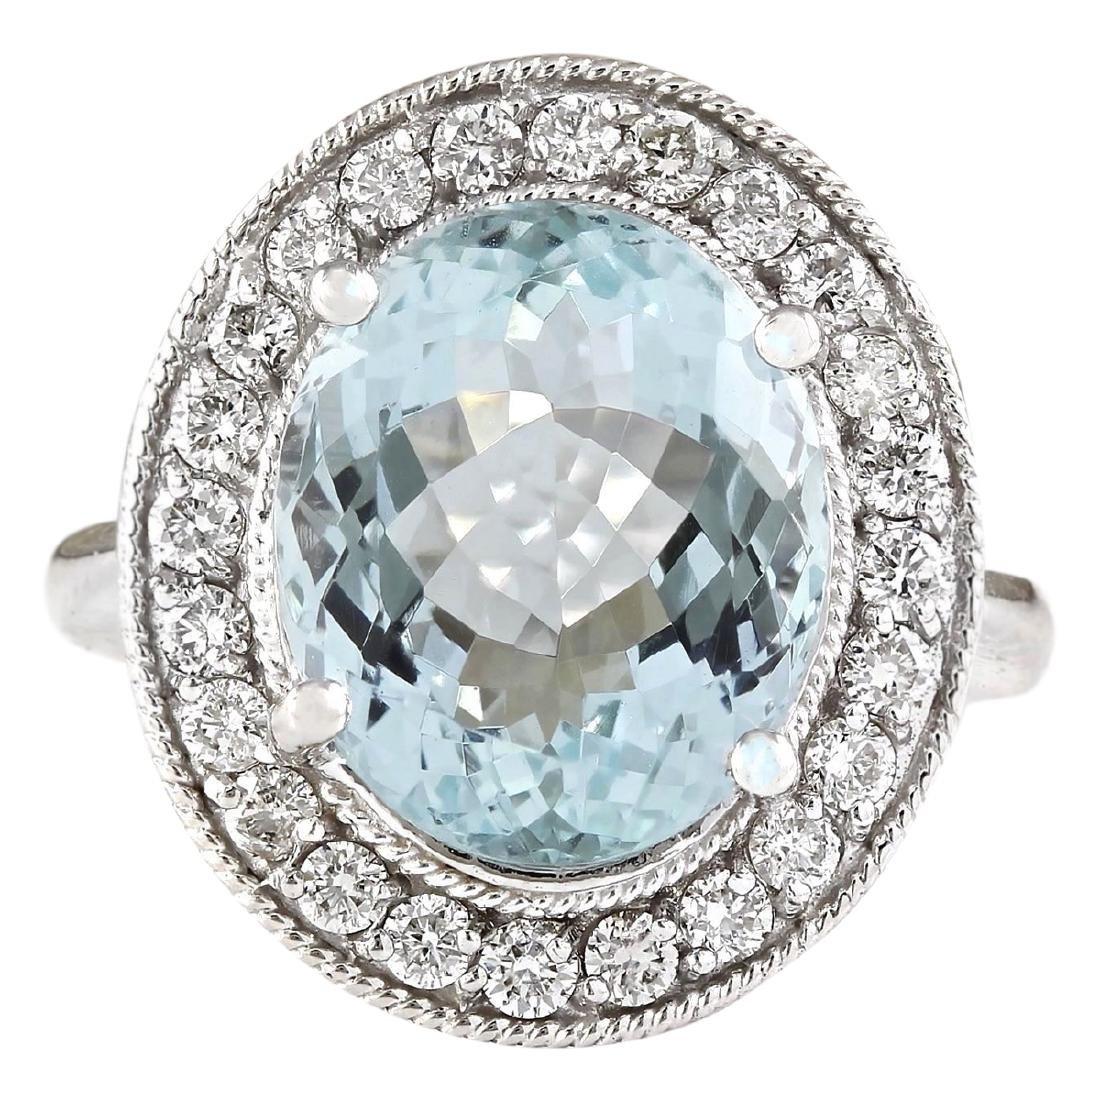 6.98 CTW Natural Aquamarine And Diamond Ring In 18K